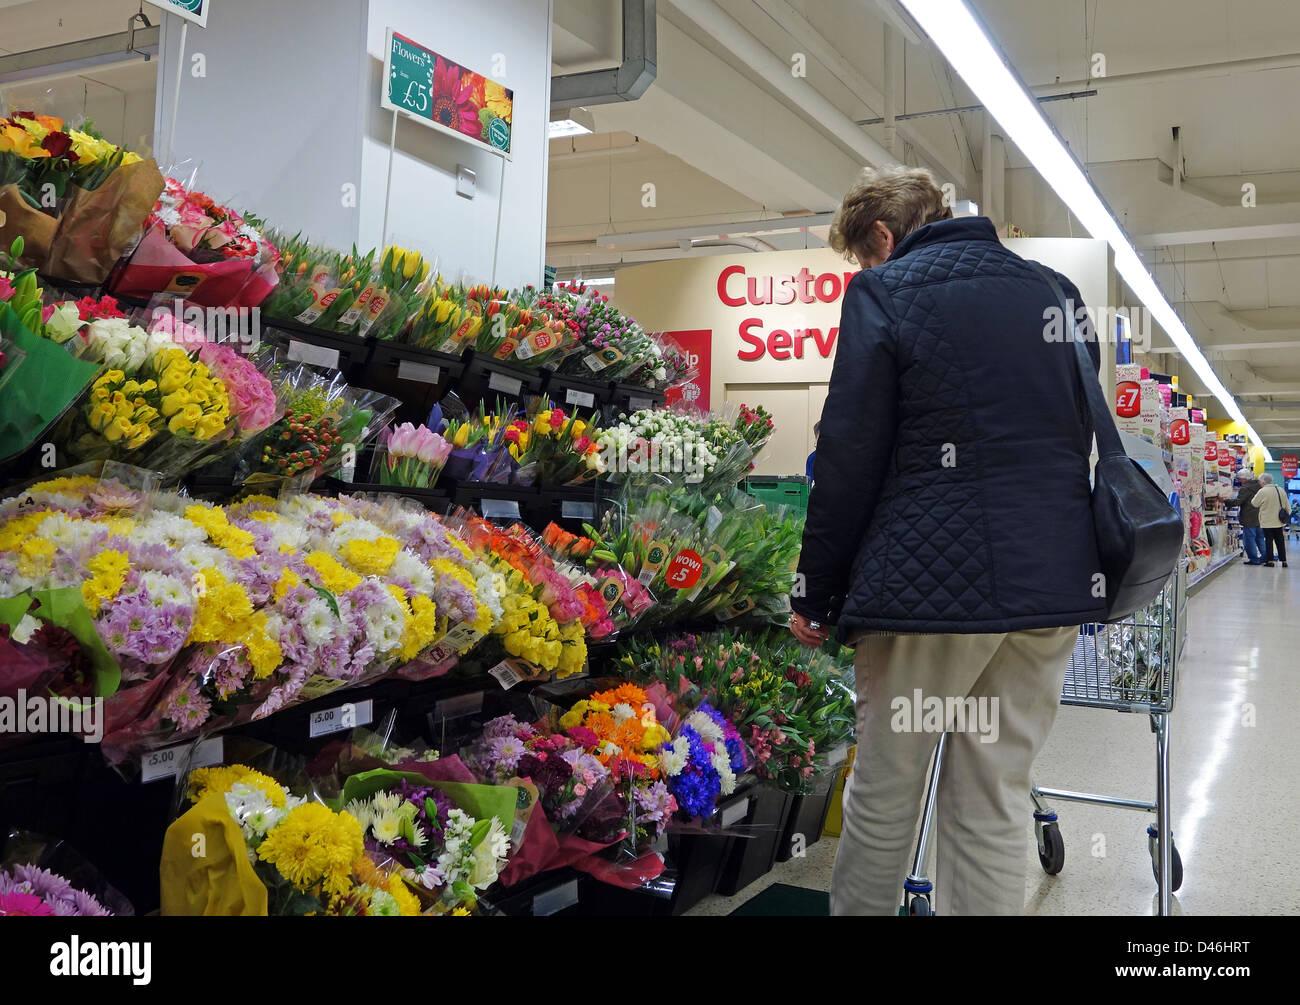 Supermarket Flowers Stock Photos & Supermarket Flowers Stock Images ...